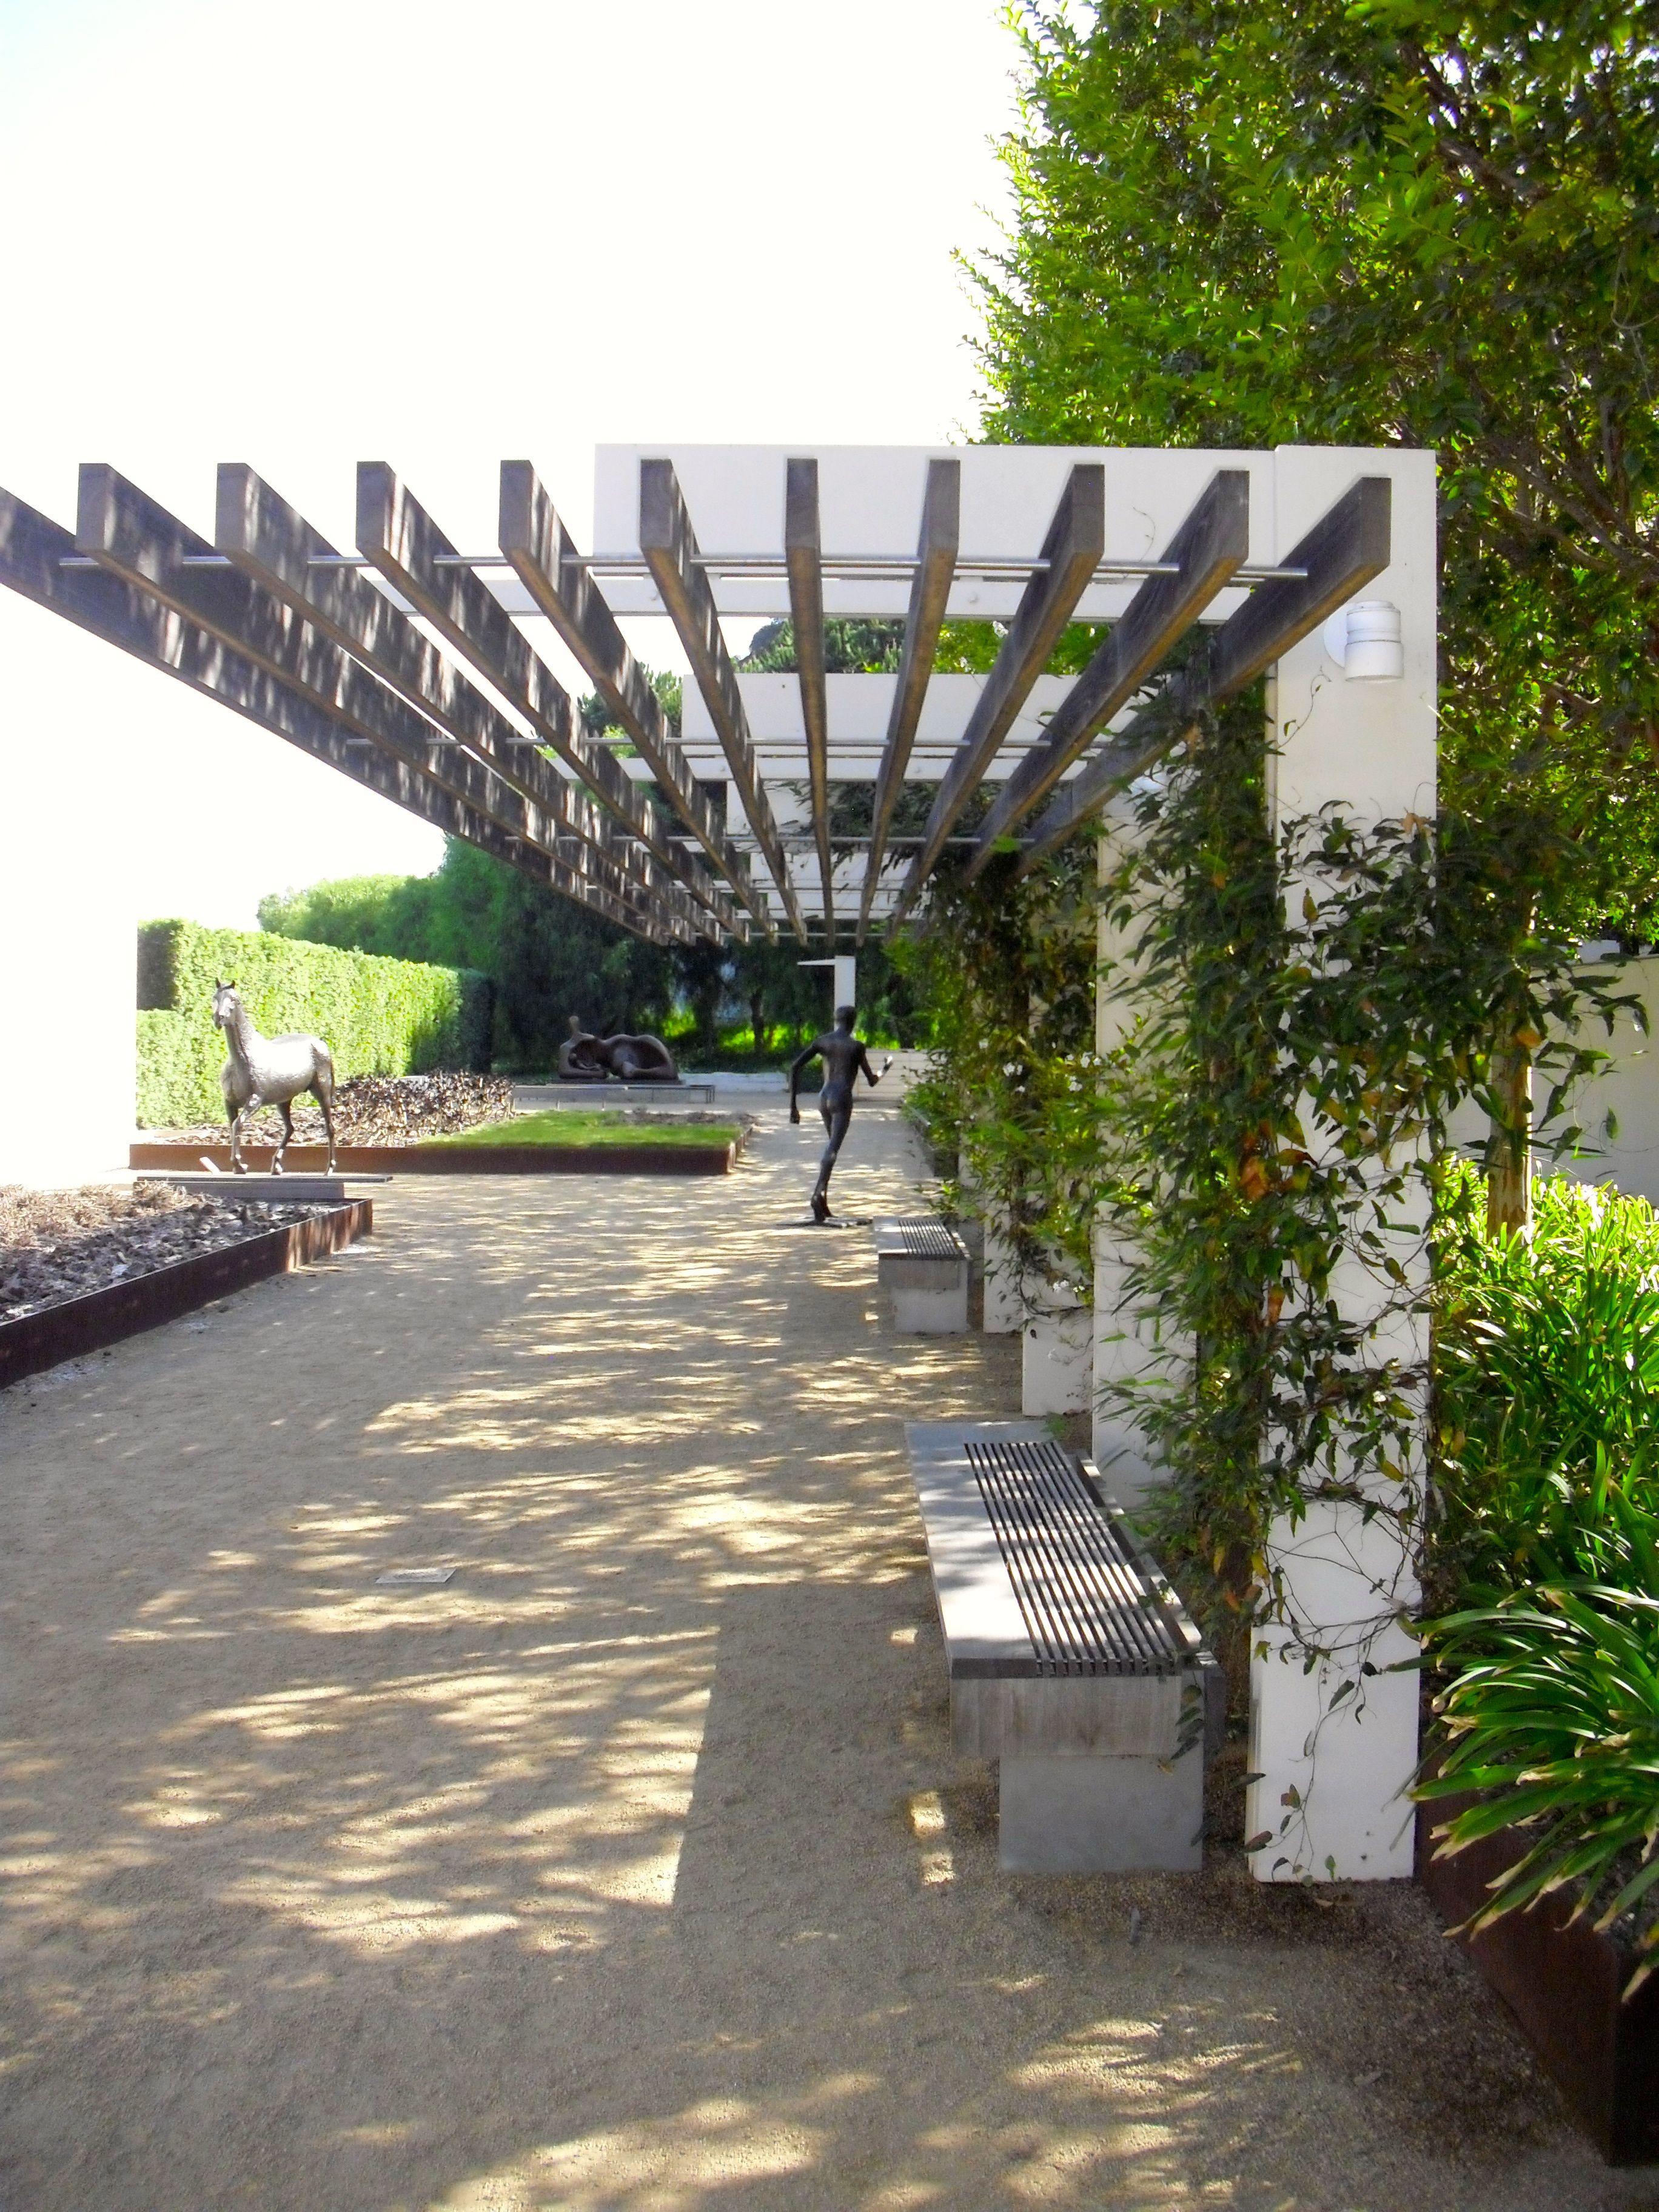 Pergola in sculpture garden. Pinned to Garden Design - Pergolas by Darin Bradbury ...